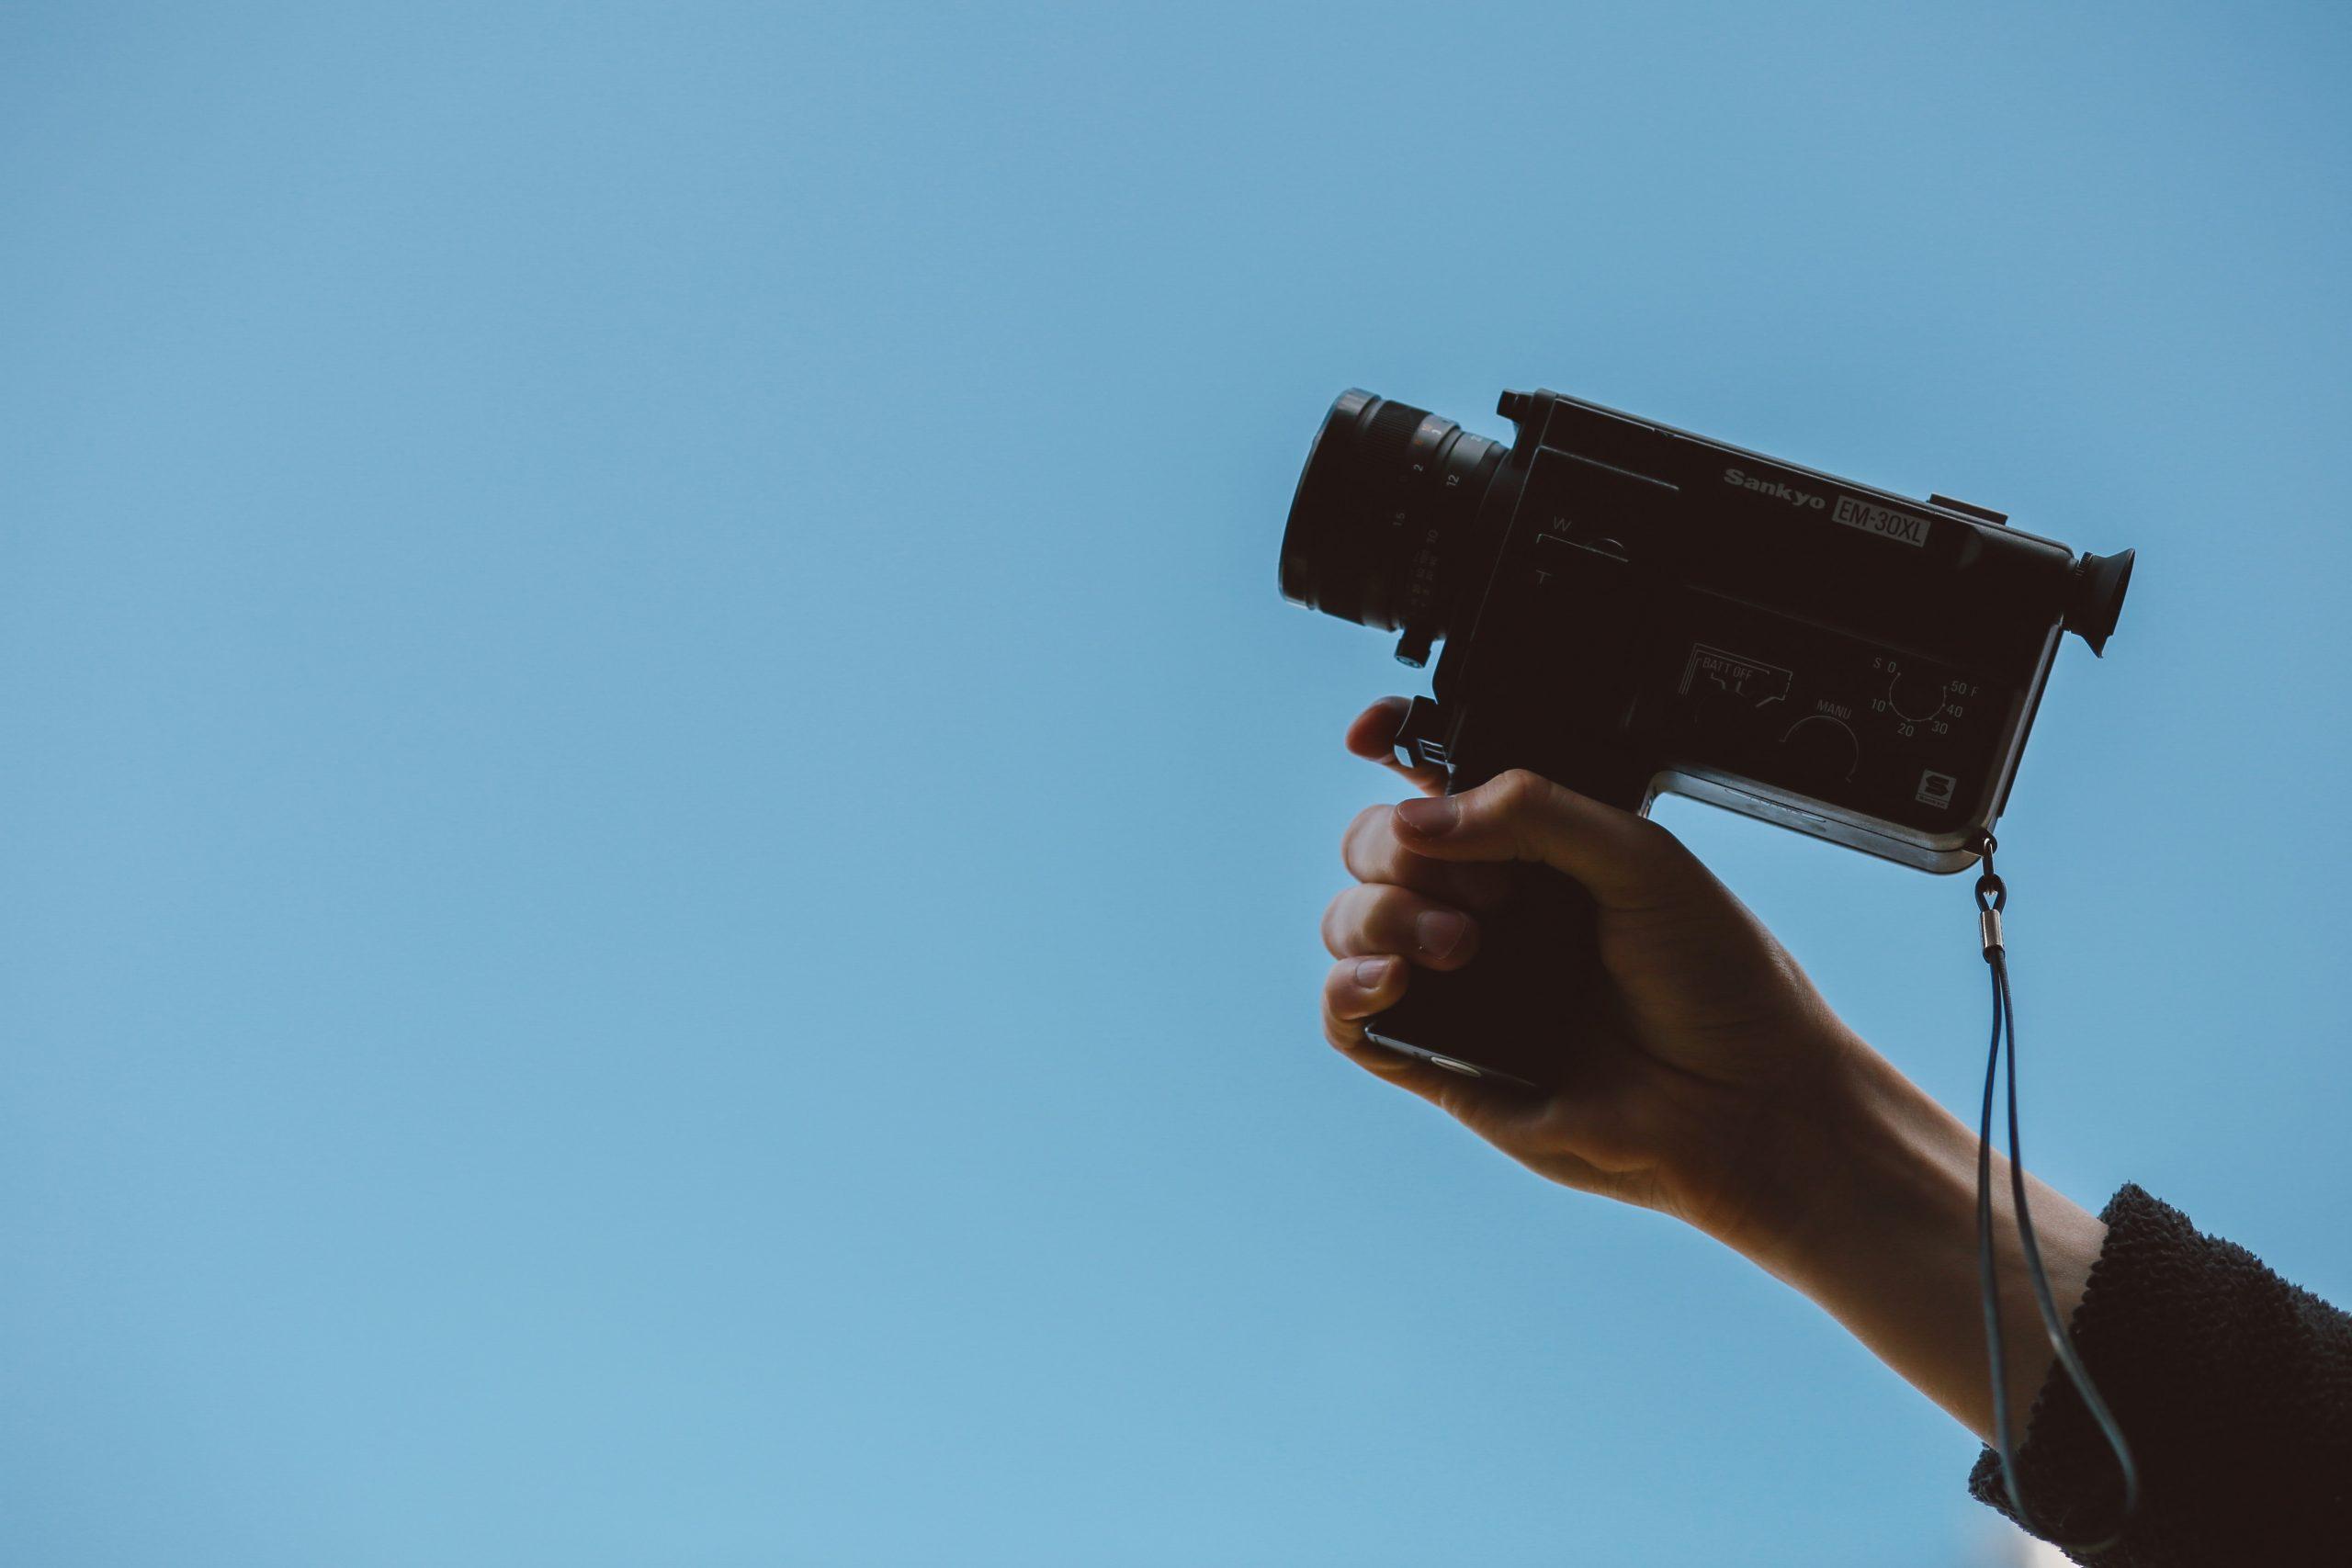 videoproduktion pris